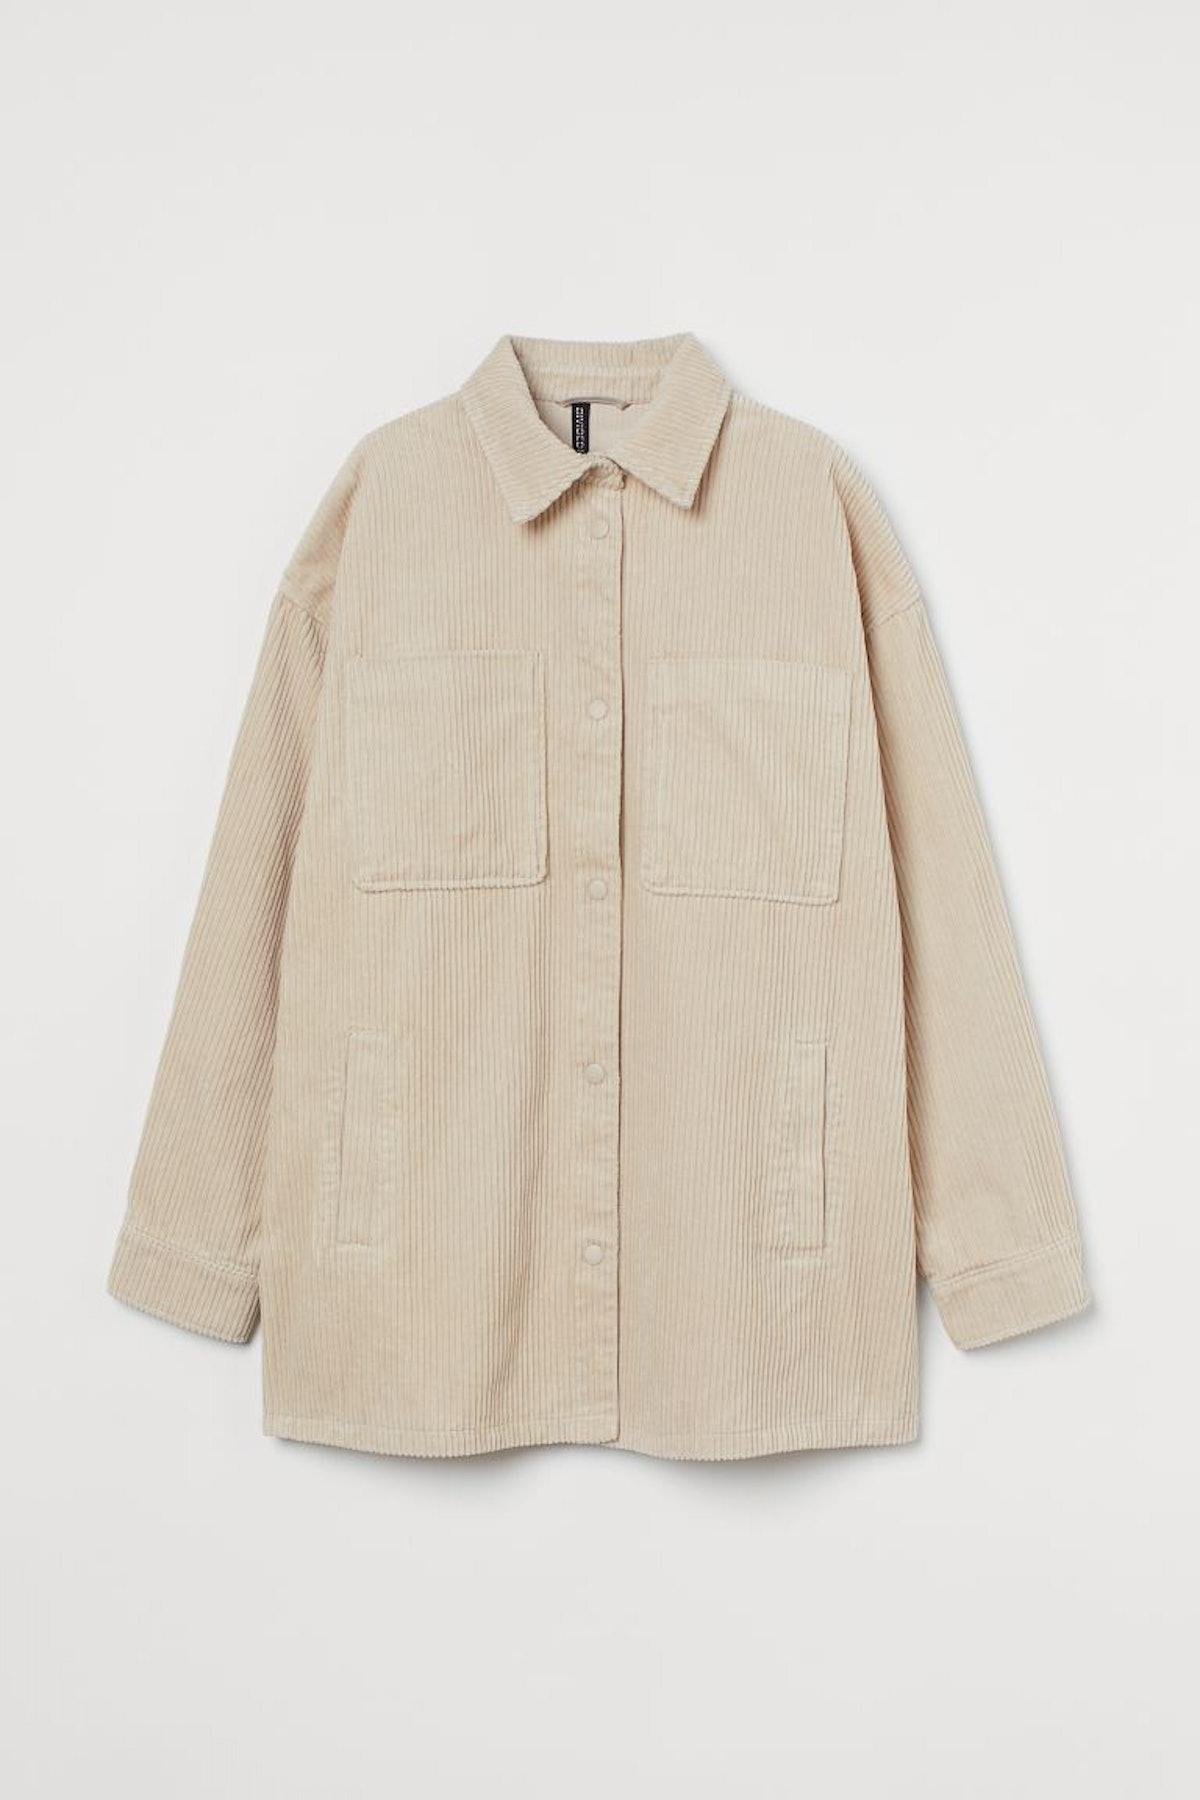 H&M Shirt Jacket.